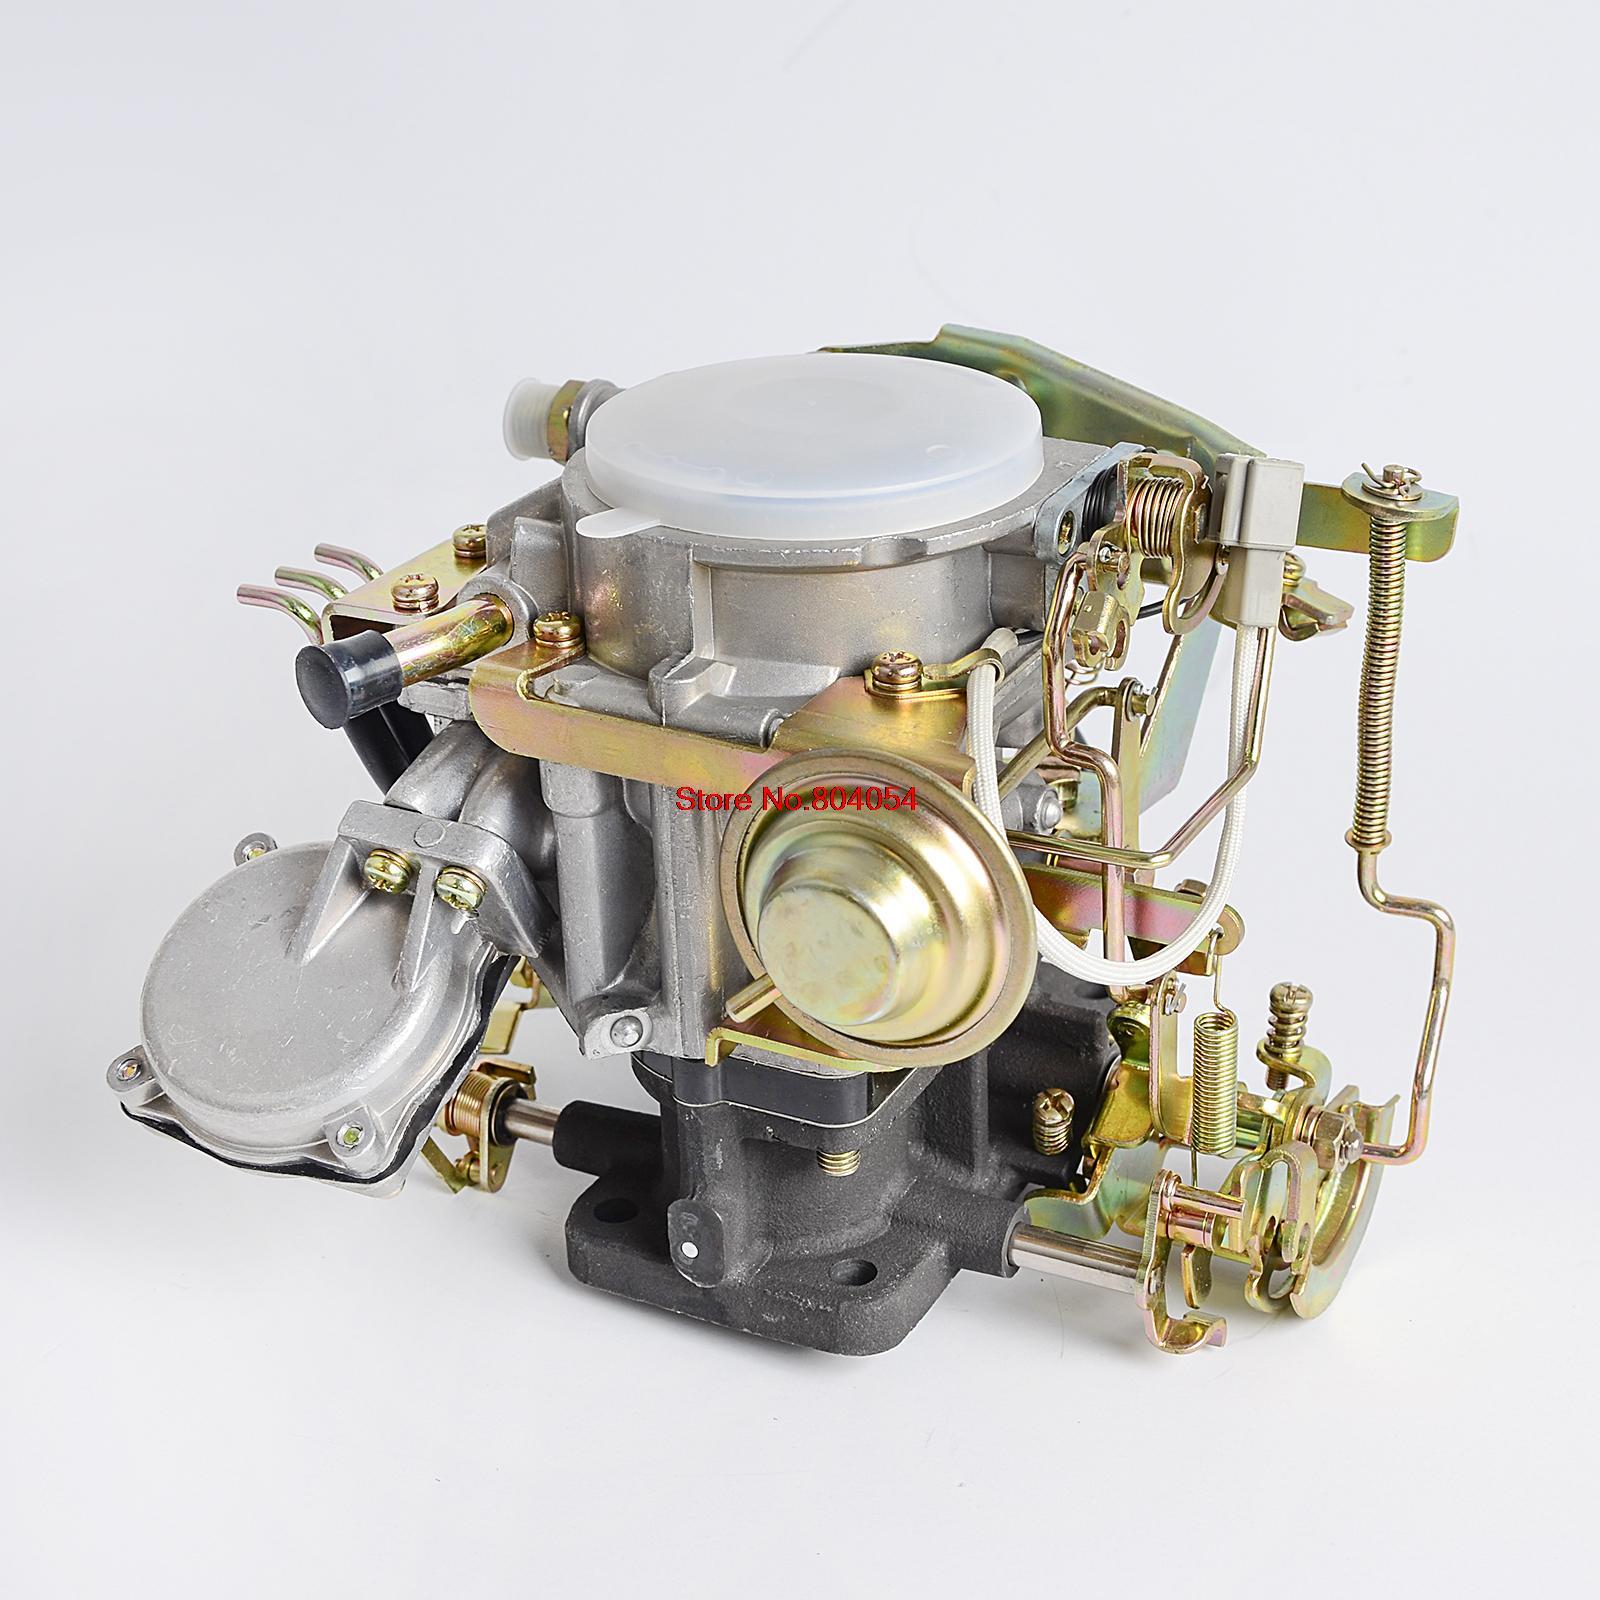 New Carburetor fits for TOYOTA 3F LAND CRUISER Carby Parts Number : 21100-61360 ботильоны evigi evigi mp002xw0e20l